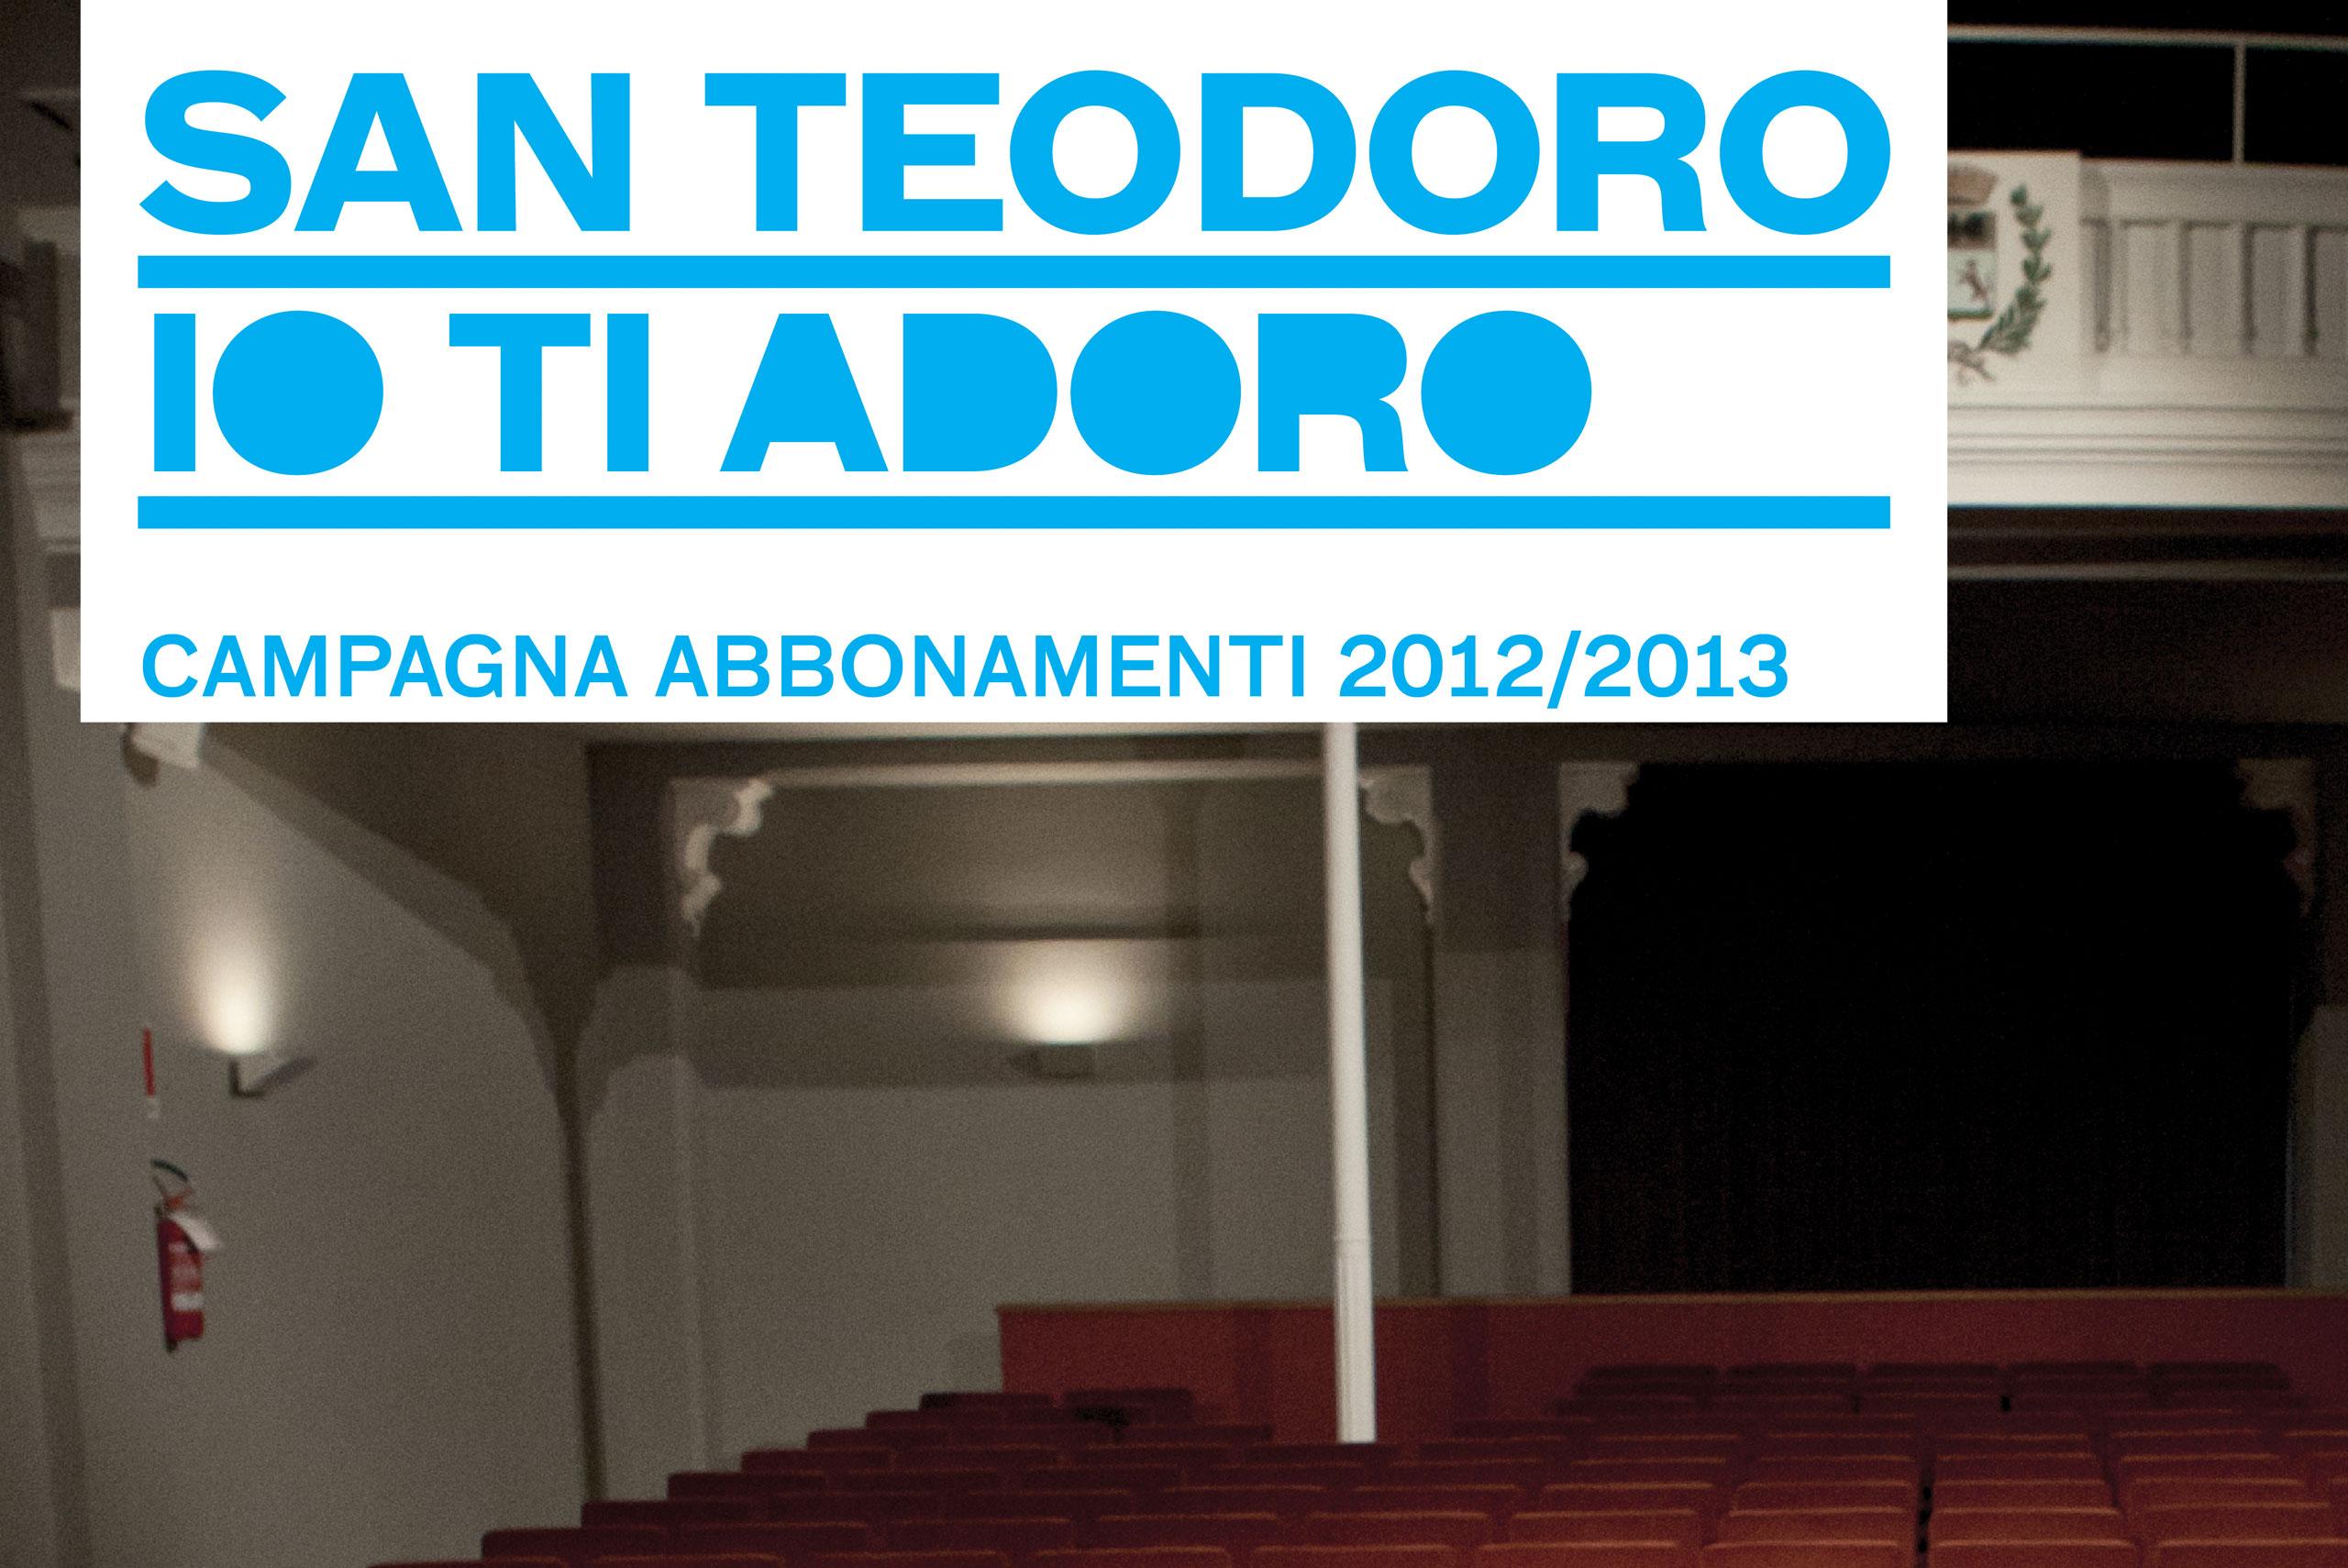 1 - design logo campagna promozionale teatro